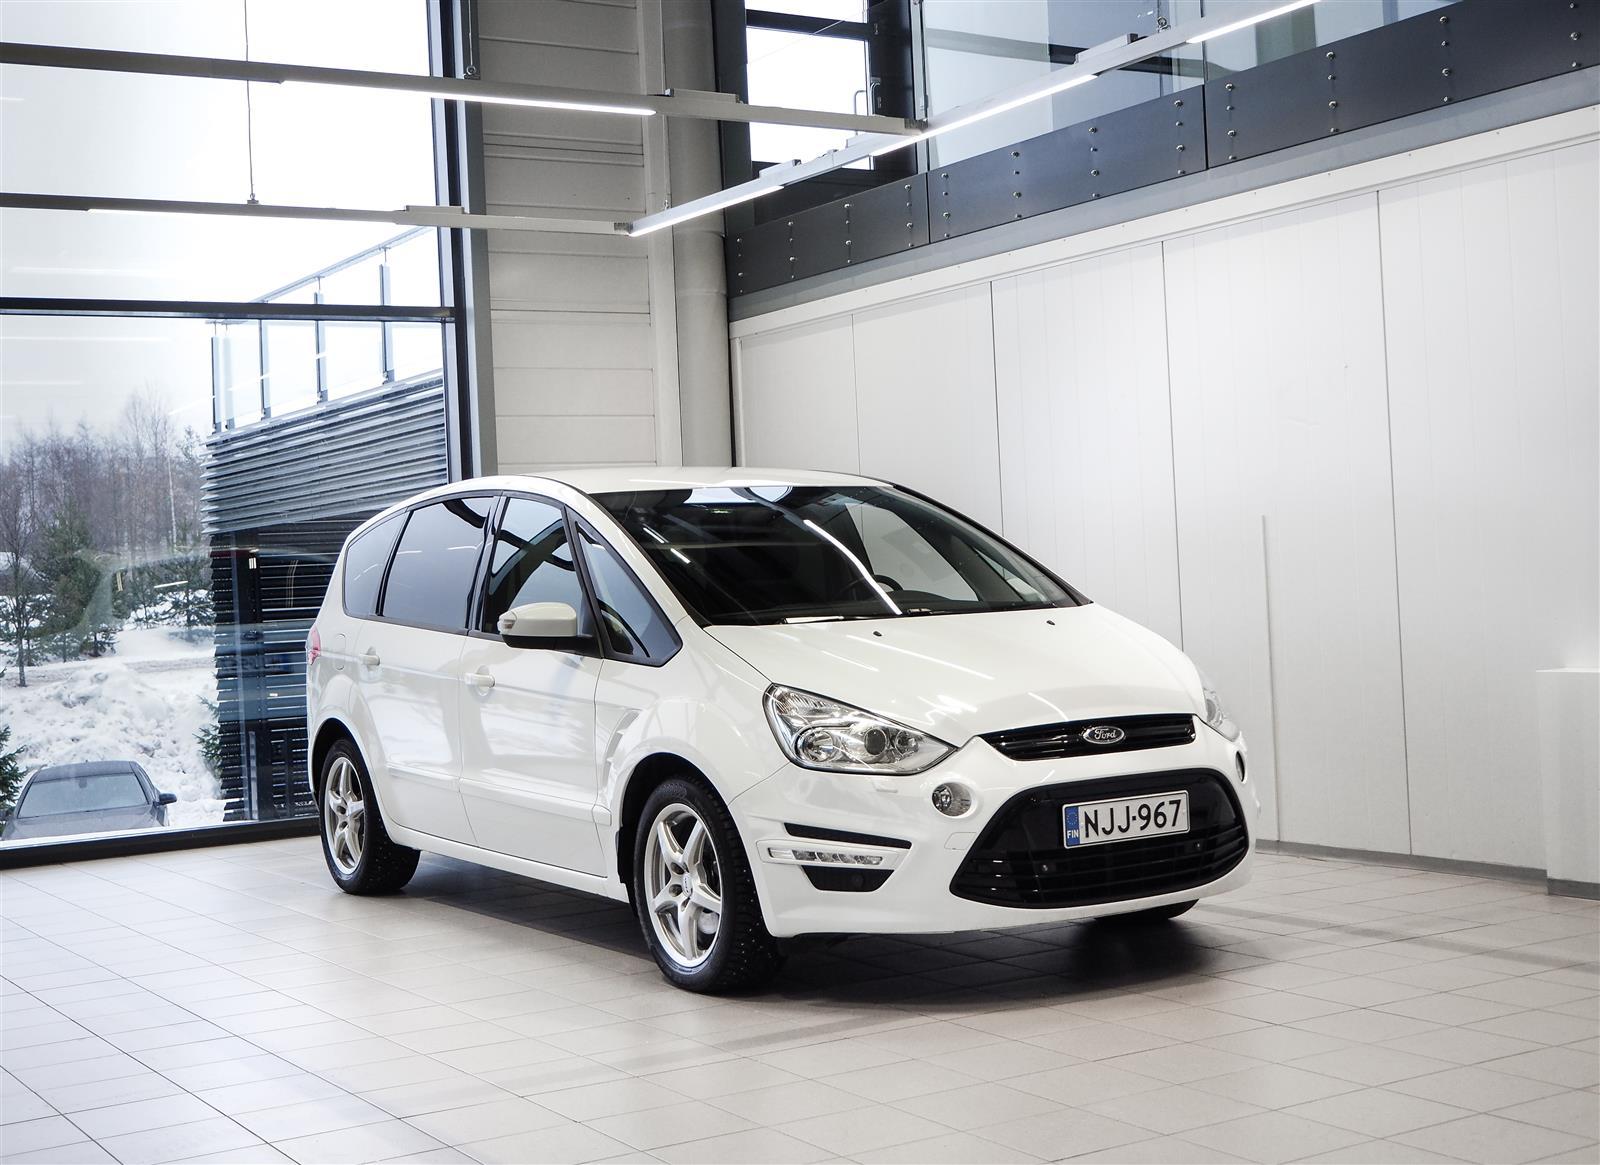 Ford S-Max 2,0 TDCi Aut + 7-Paikkainen + Navi + Webasto + BiXenon + Tutka + Sis. ALV 24%